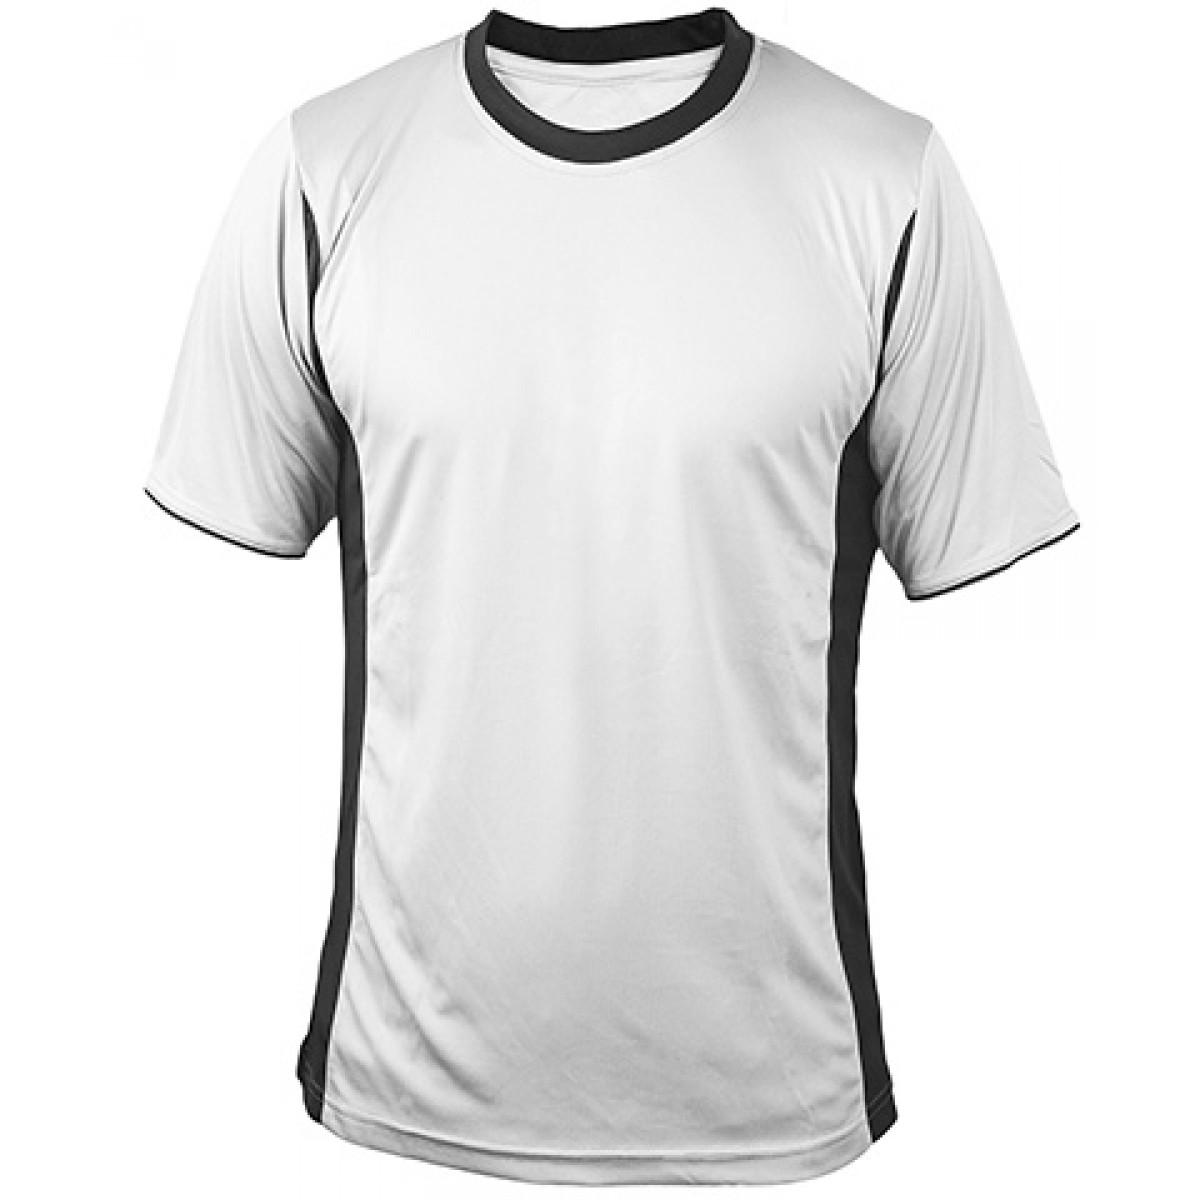 White Short Sleeves Performance With Black Side Insert-Black-YM